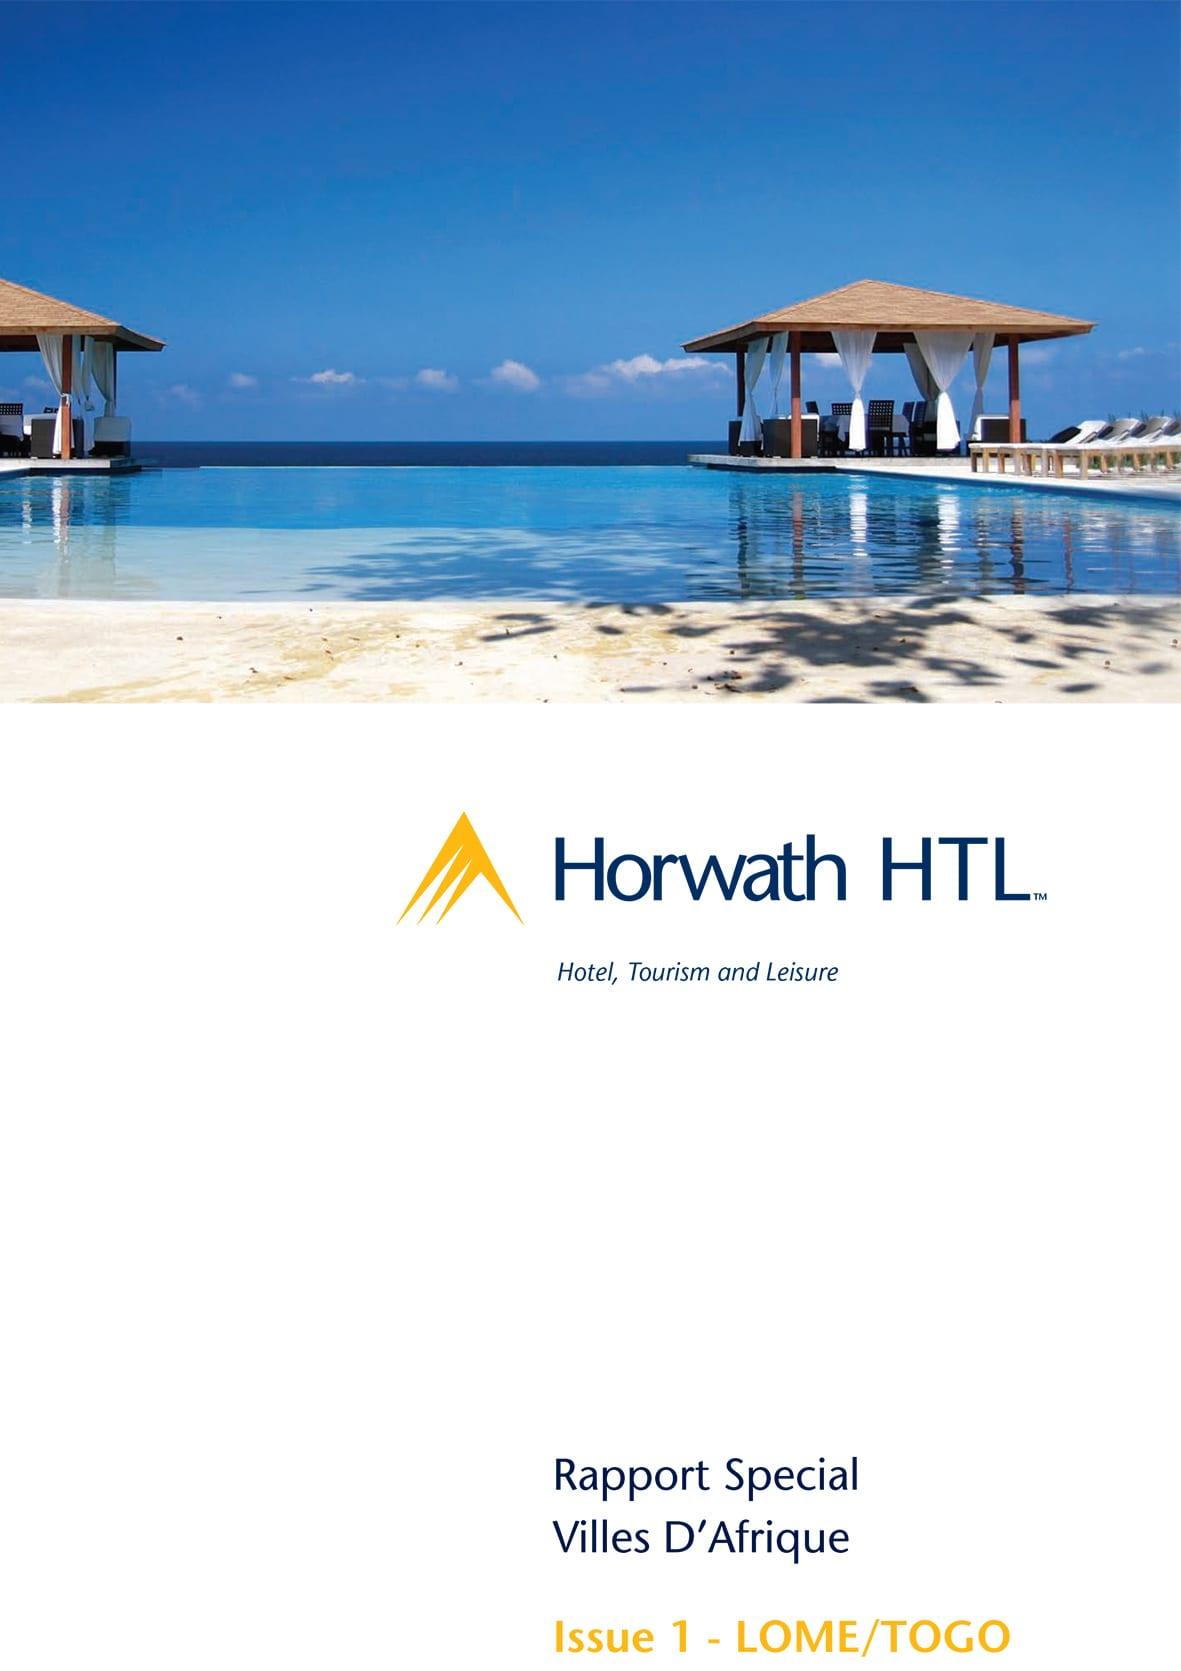 Horwath HTL Market Report 6 Togo 1